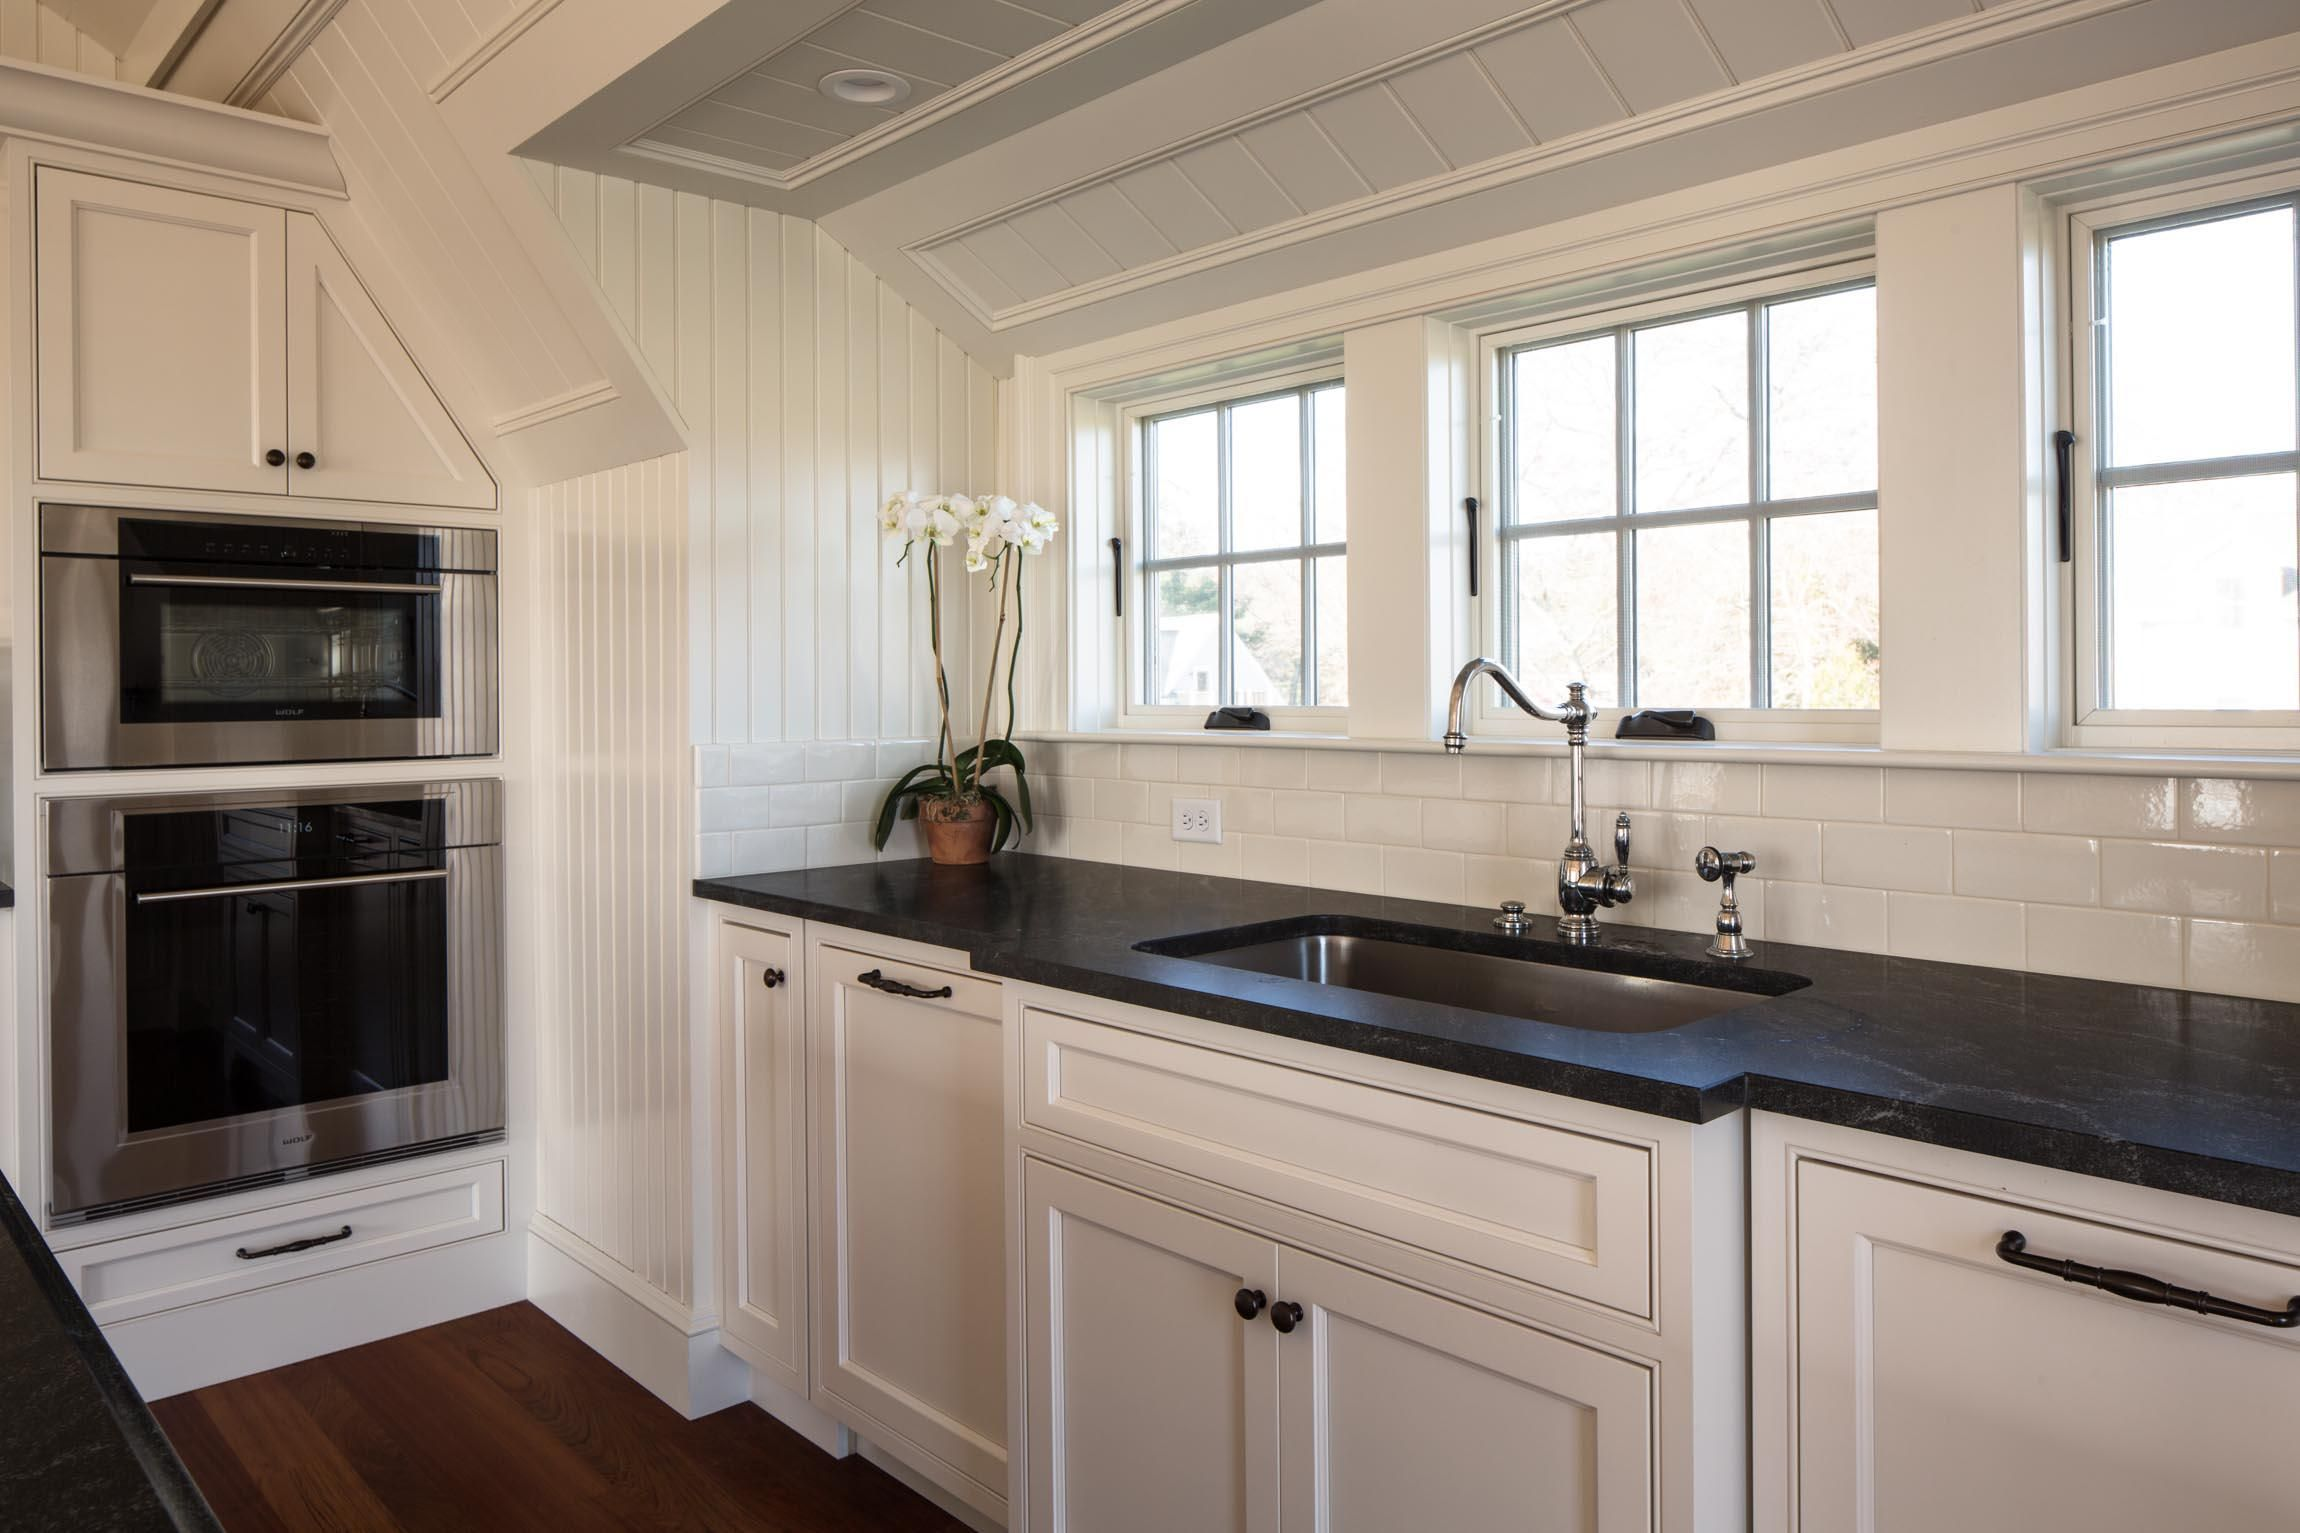 Hckitchens Boston Luxury Kitchens Kitchens Bathrooms Kitchen Cabinets